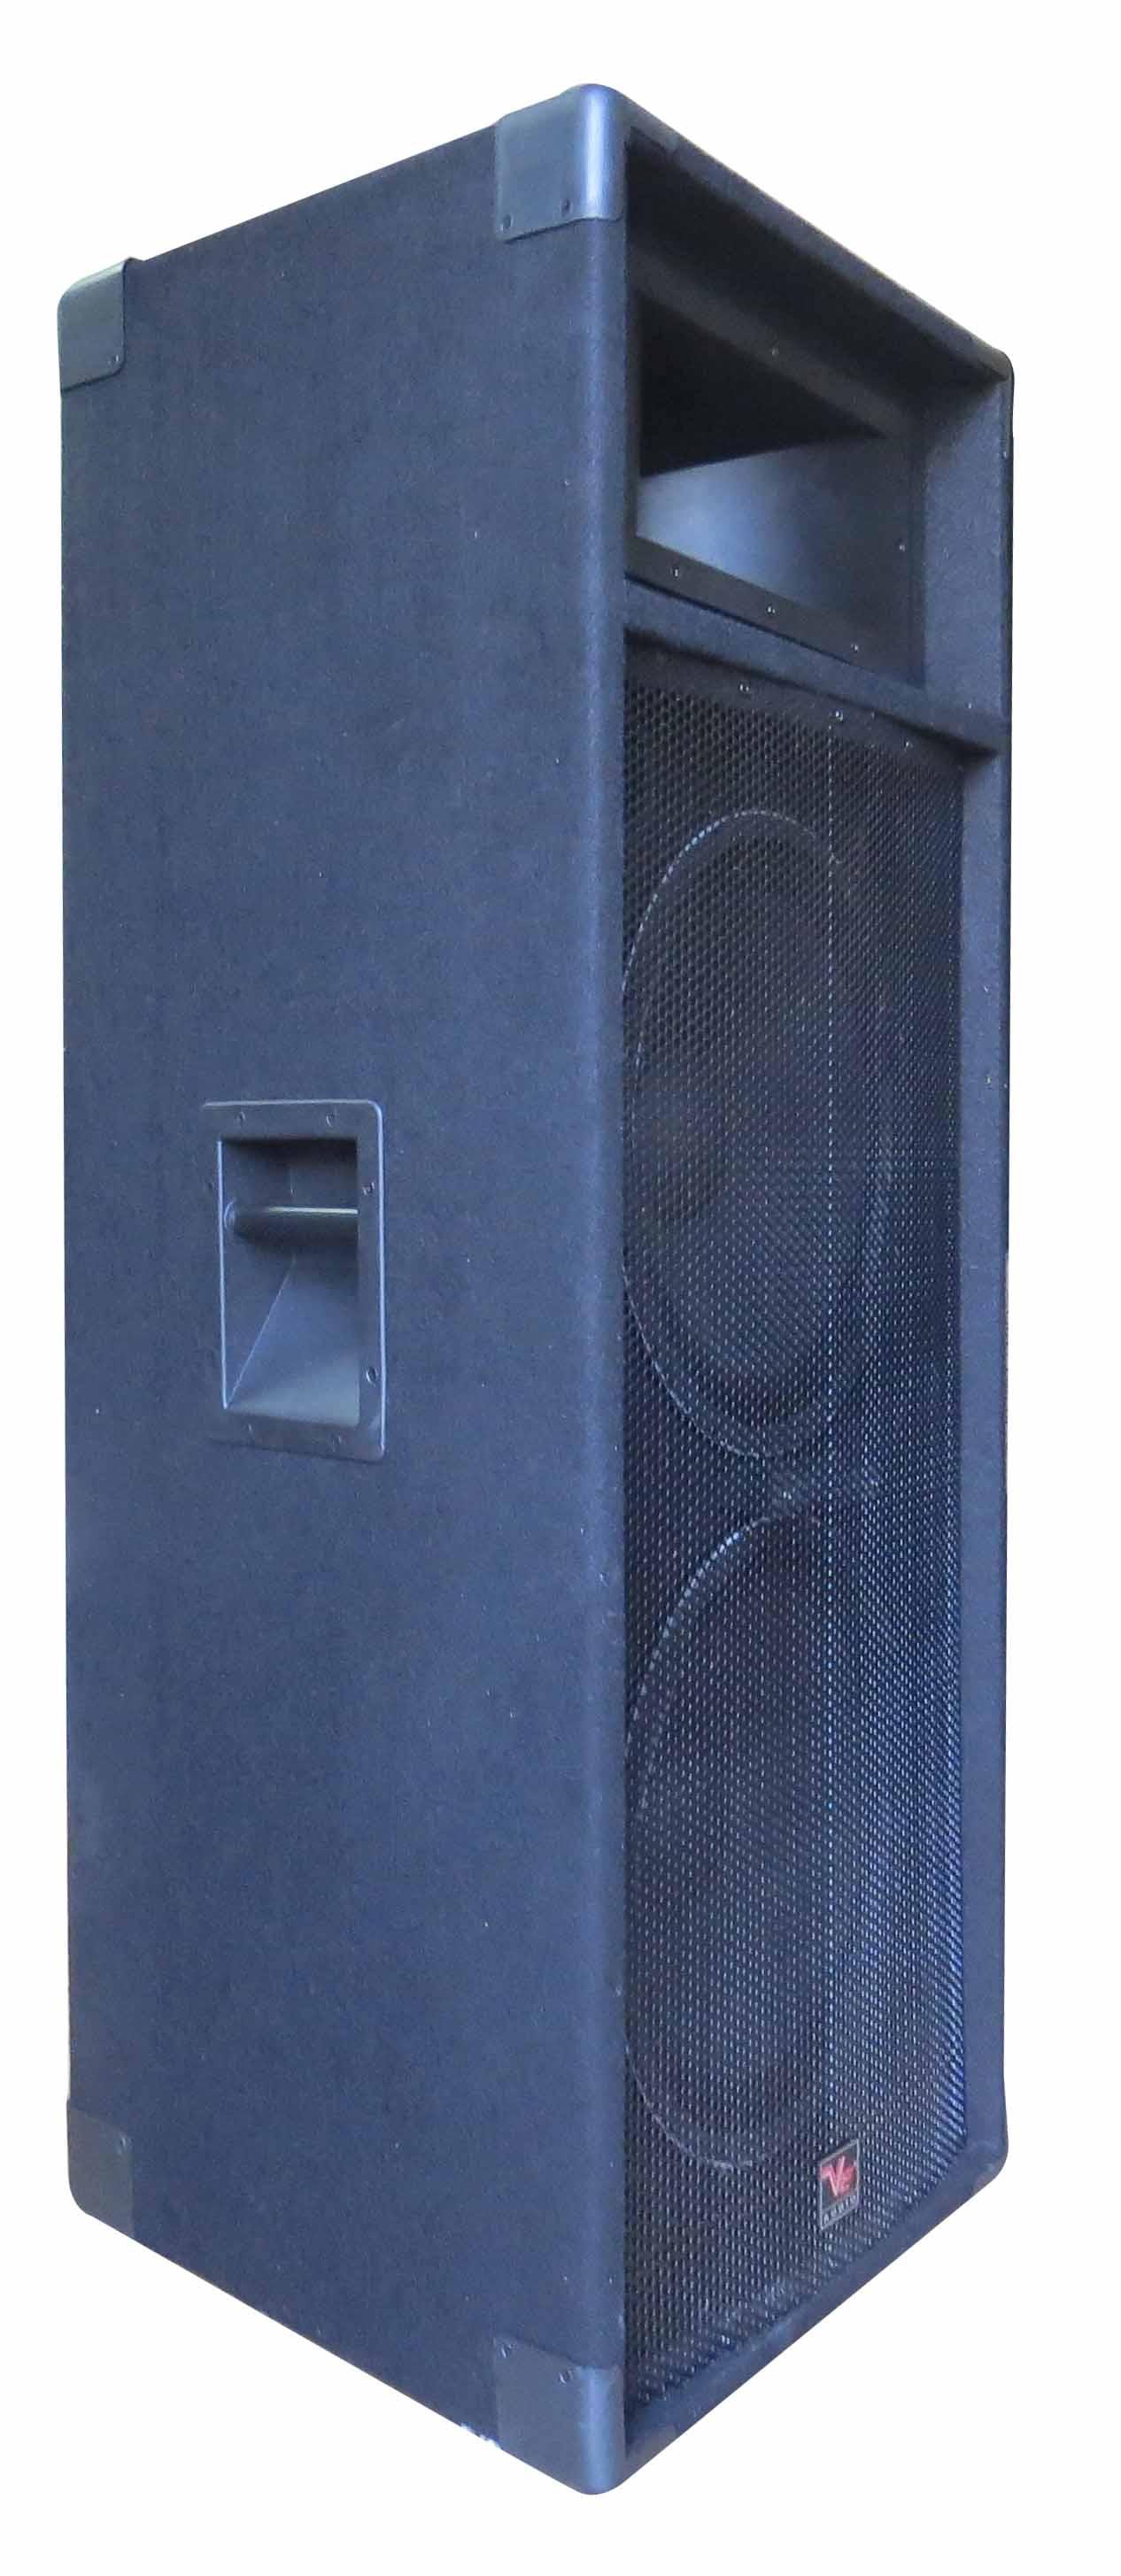 Loa hội trường VE audio -VN725